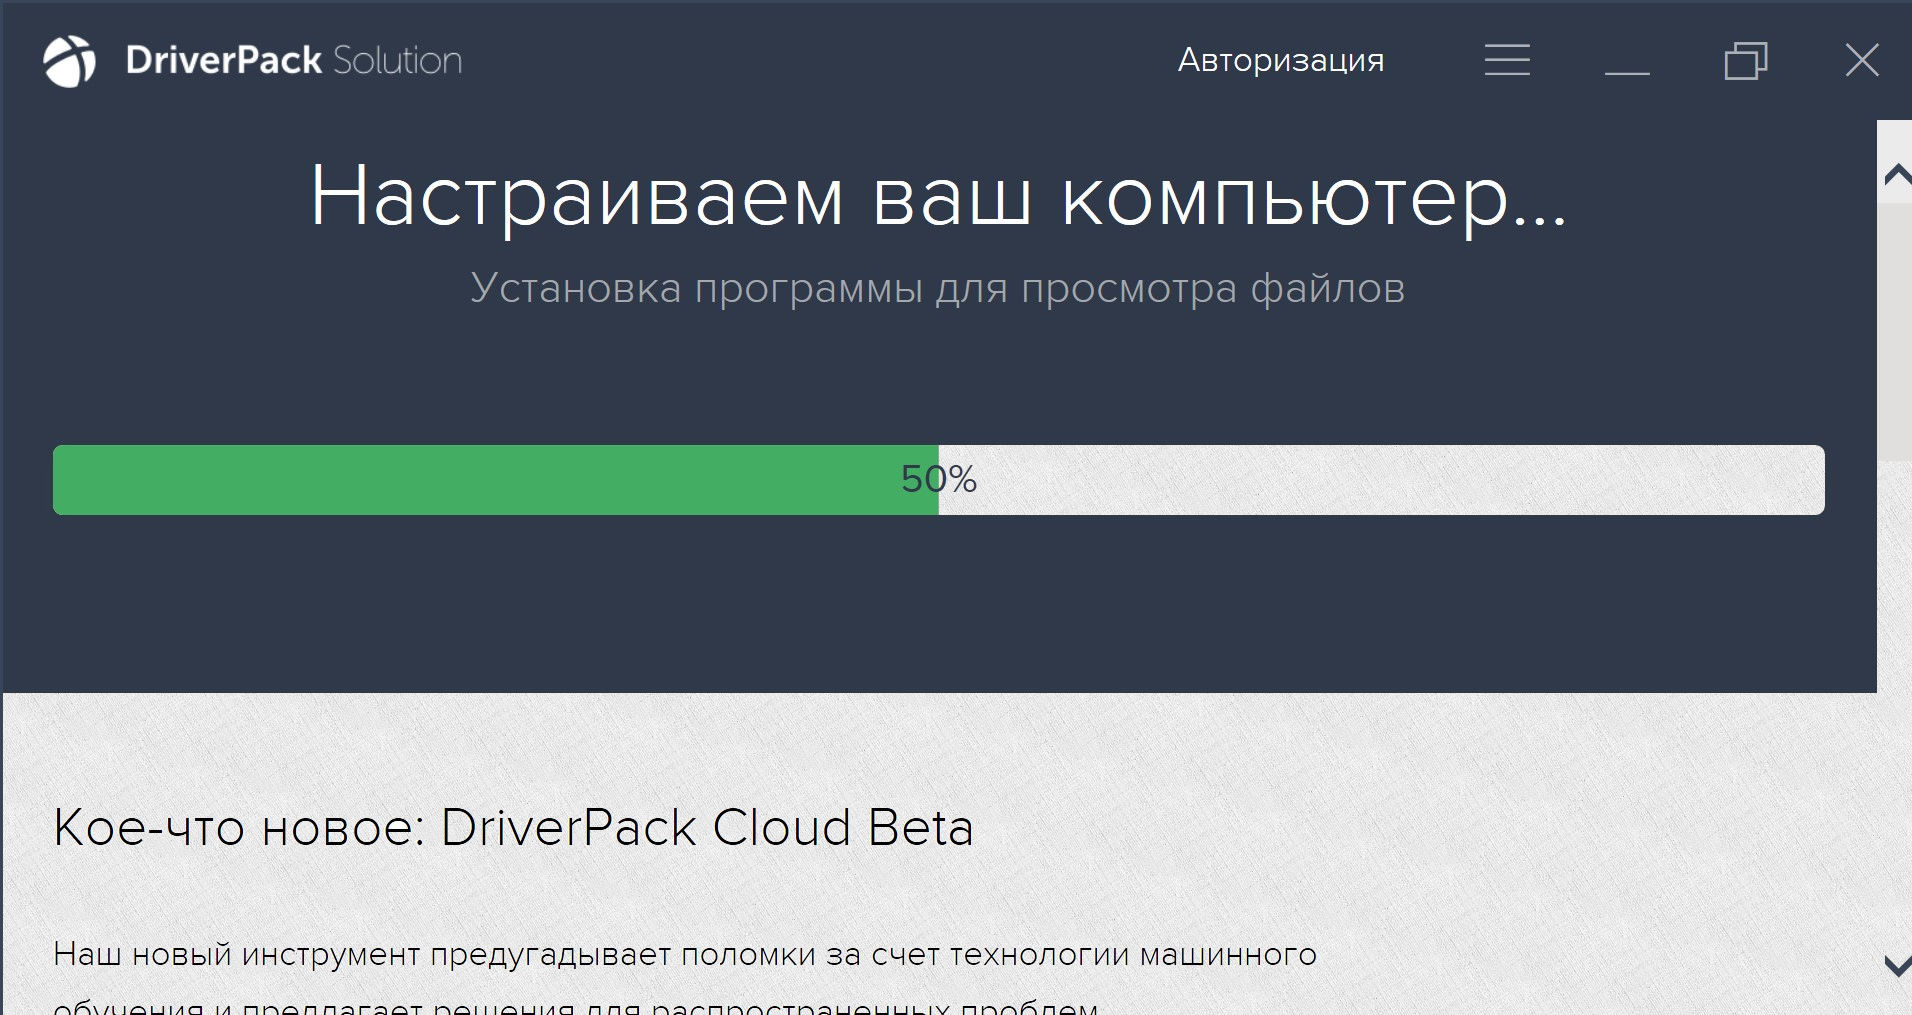 DriverPack Solution в действии